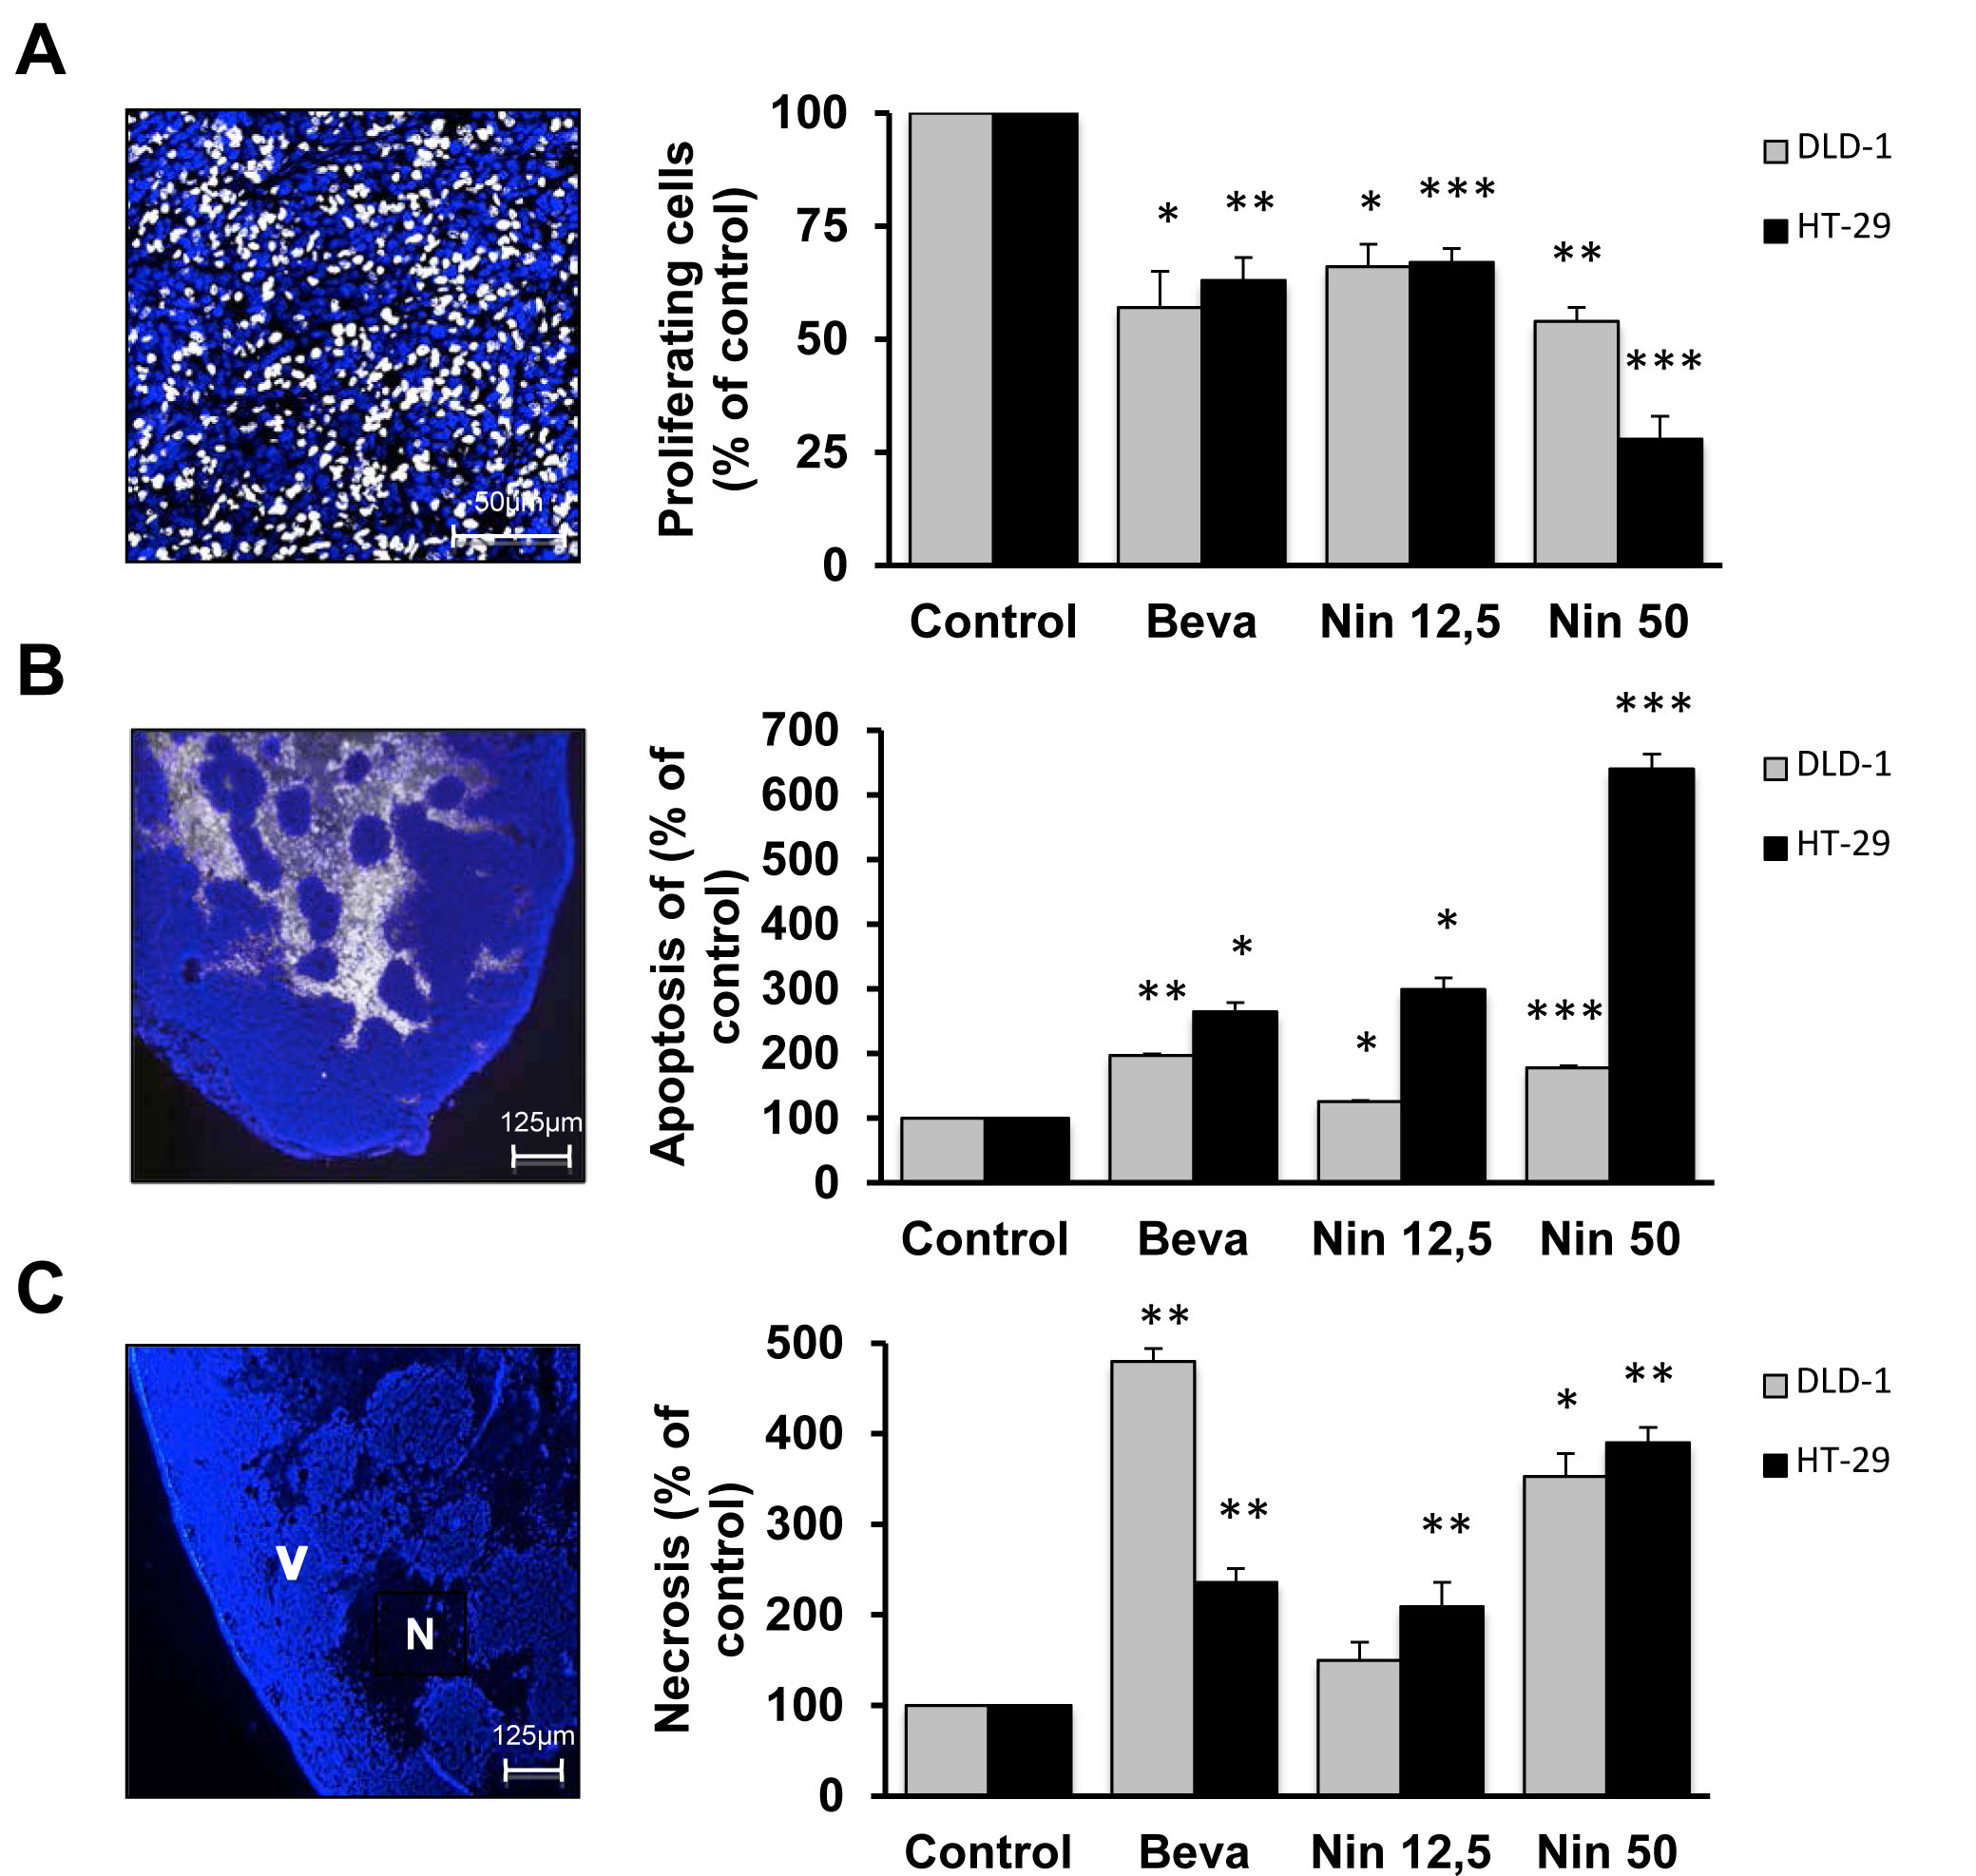 Cytostatic and cytotoxic effects of bevacizumab and nintedanib in CRC xenografts.